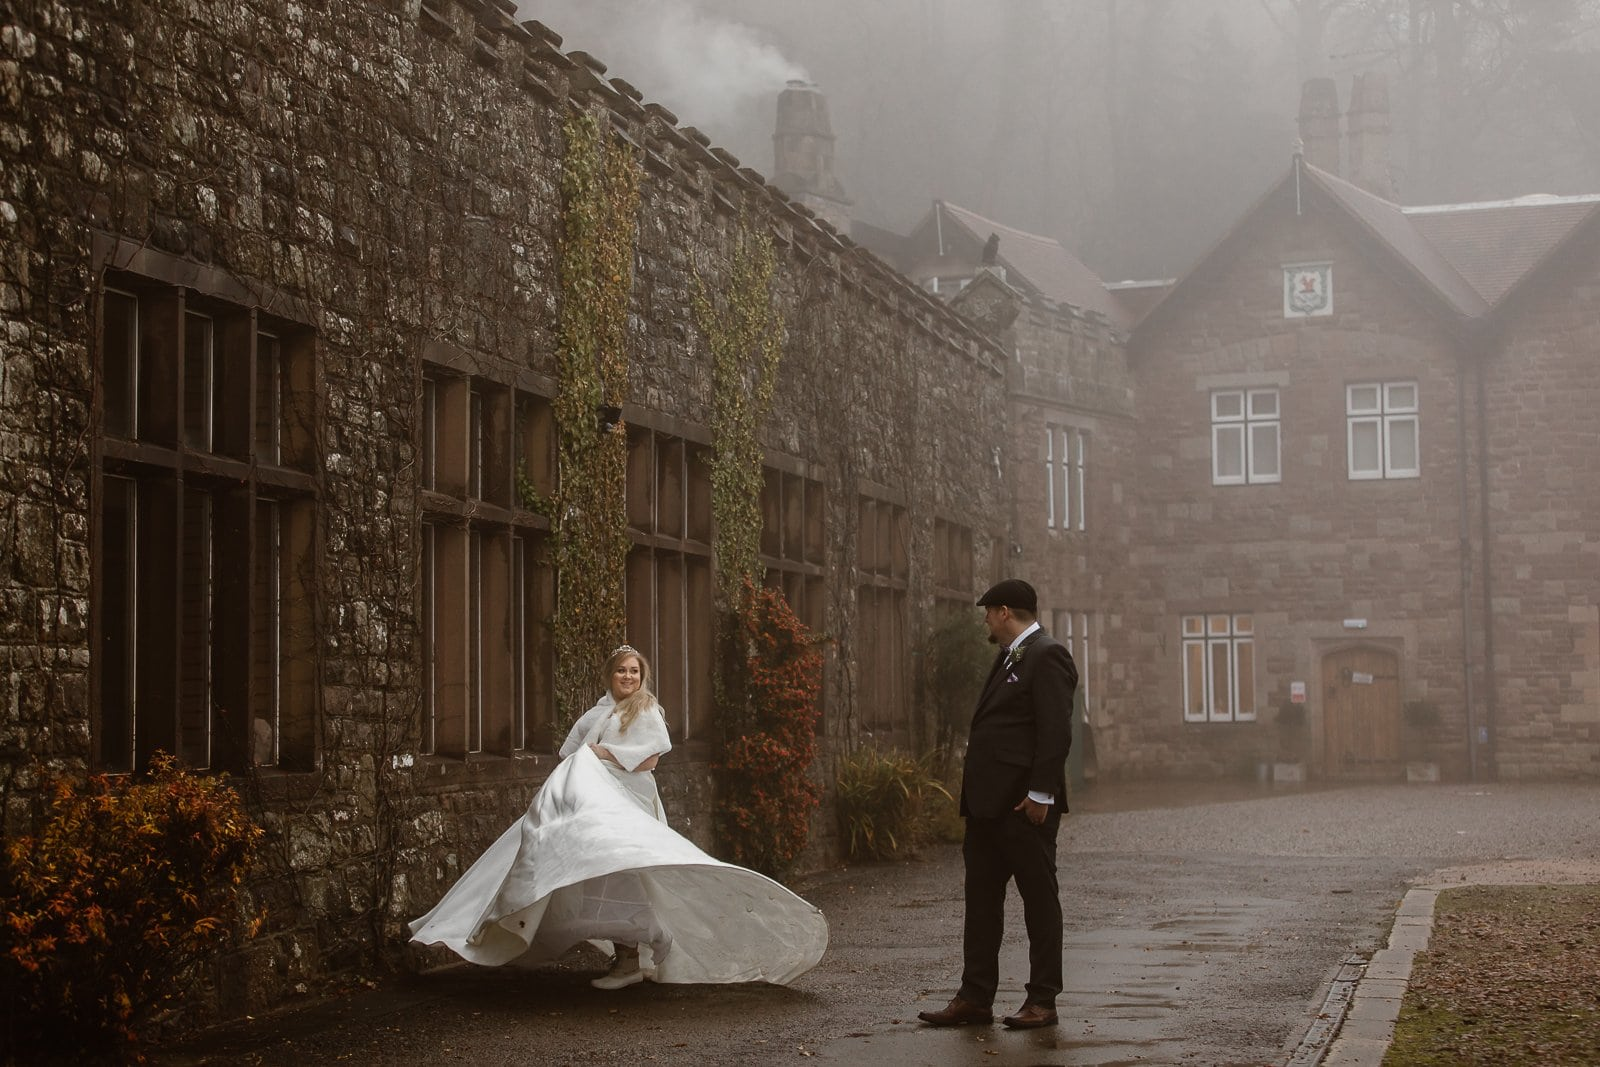 Wales-UK-CAER-LLAN-Wedding-Venue- Manmouth-WALES-destination-adventure-elopement-photographer-intimate-weddings-Justyna-E-Butler-Photography1